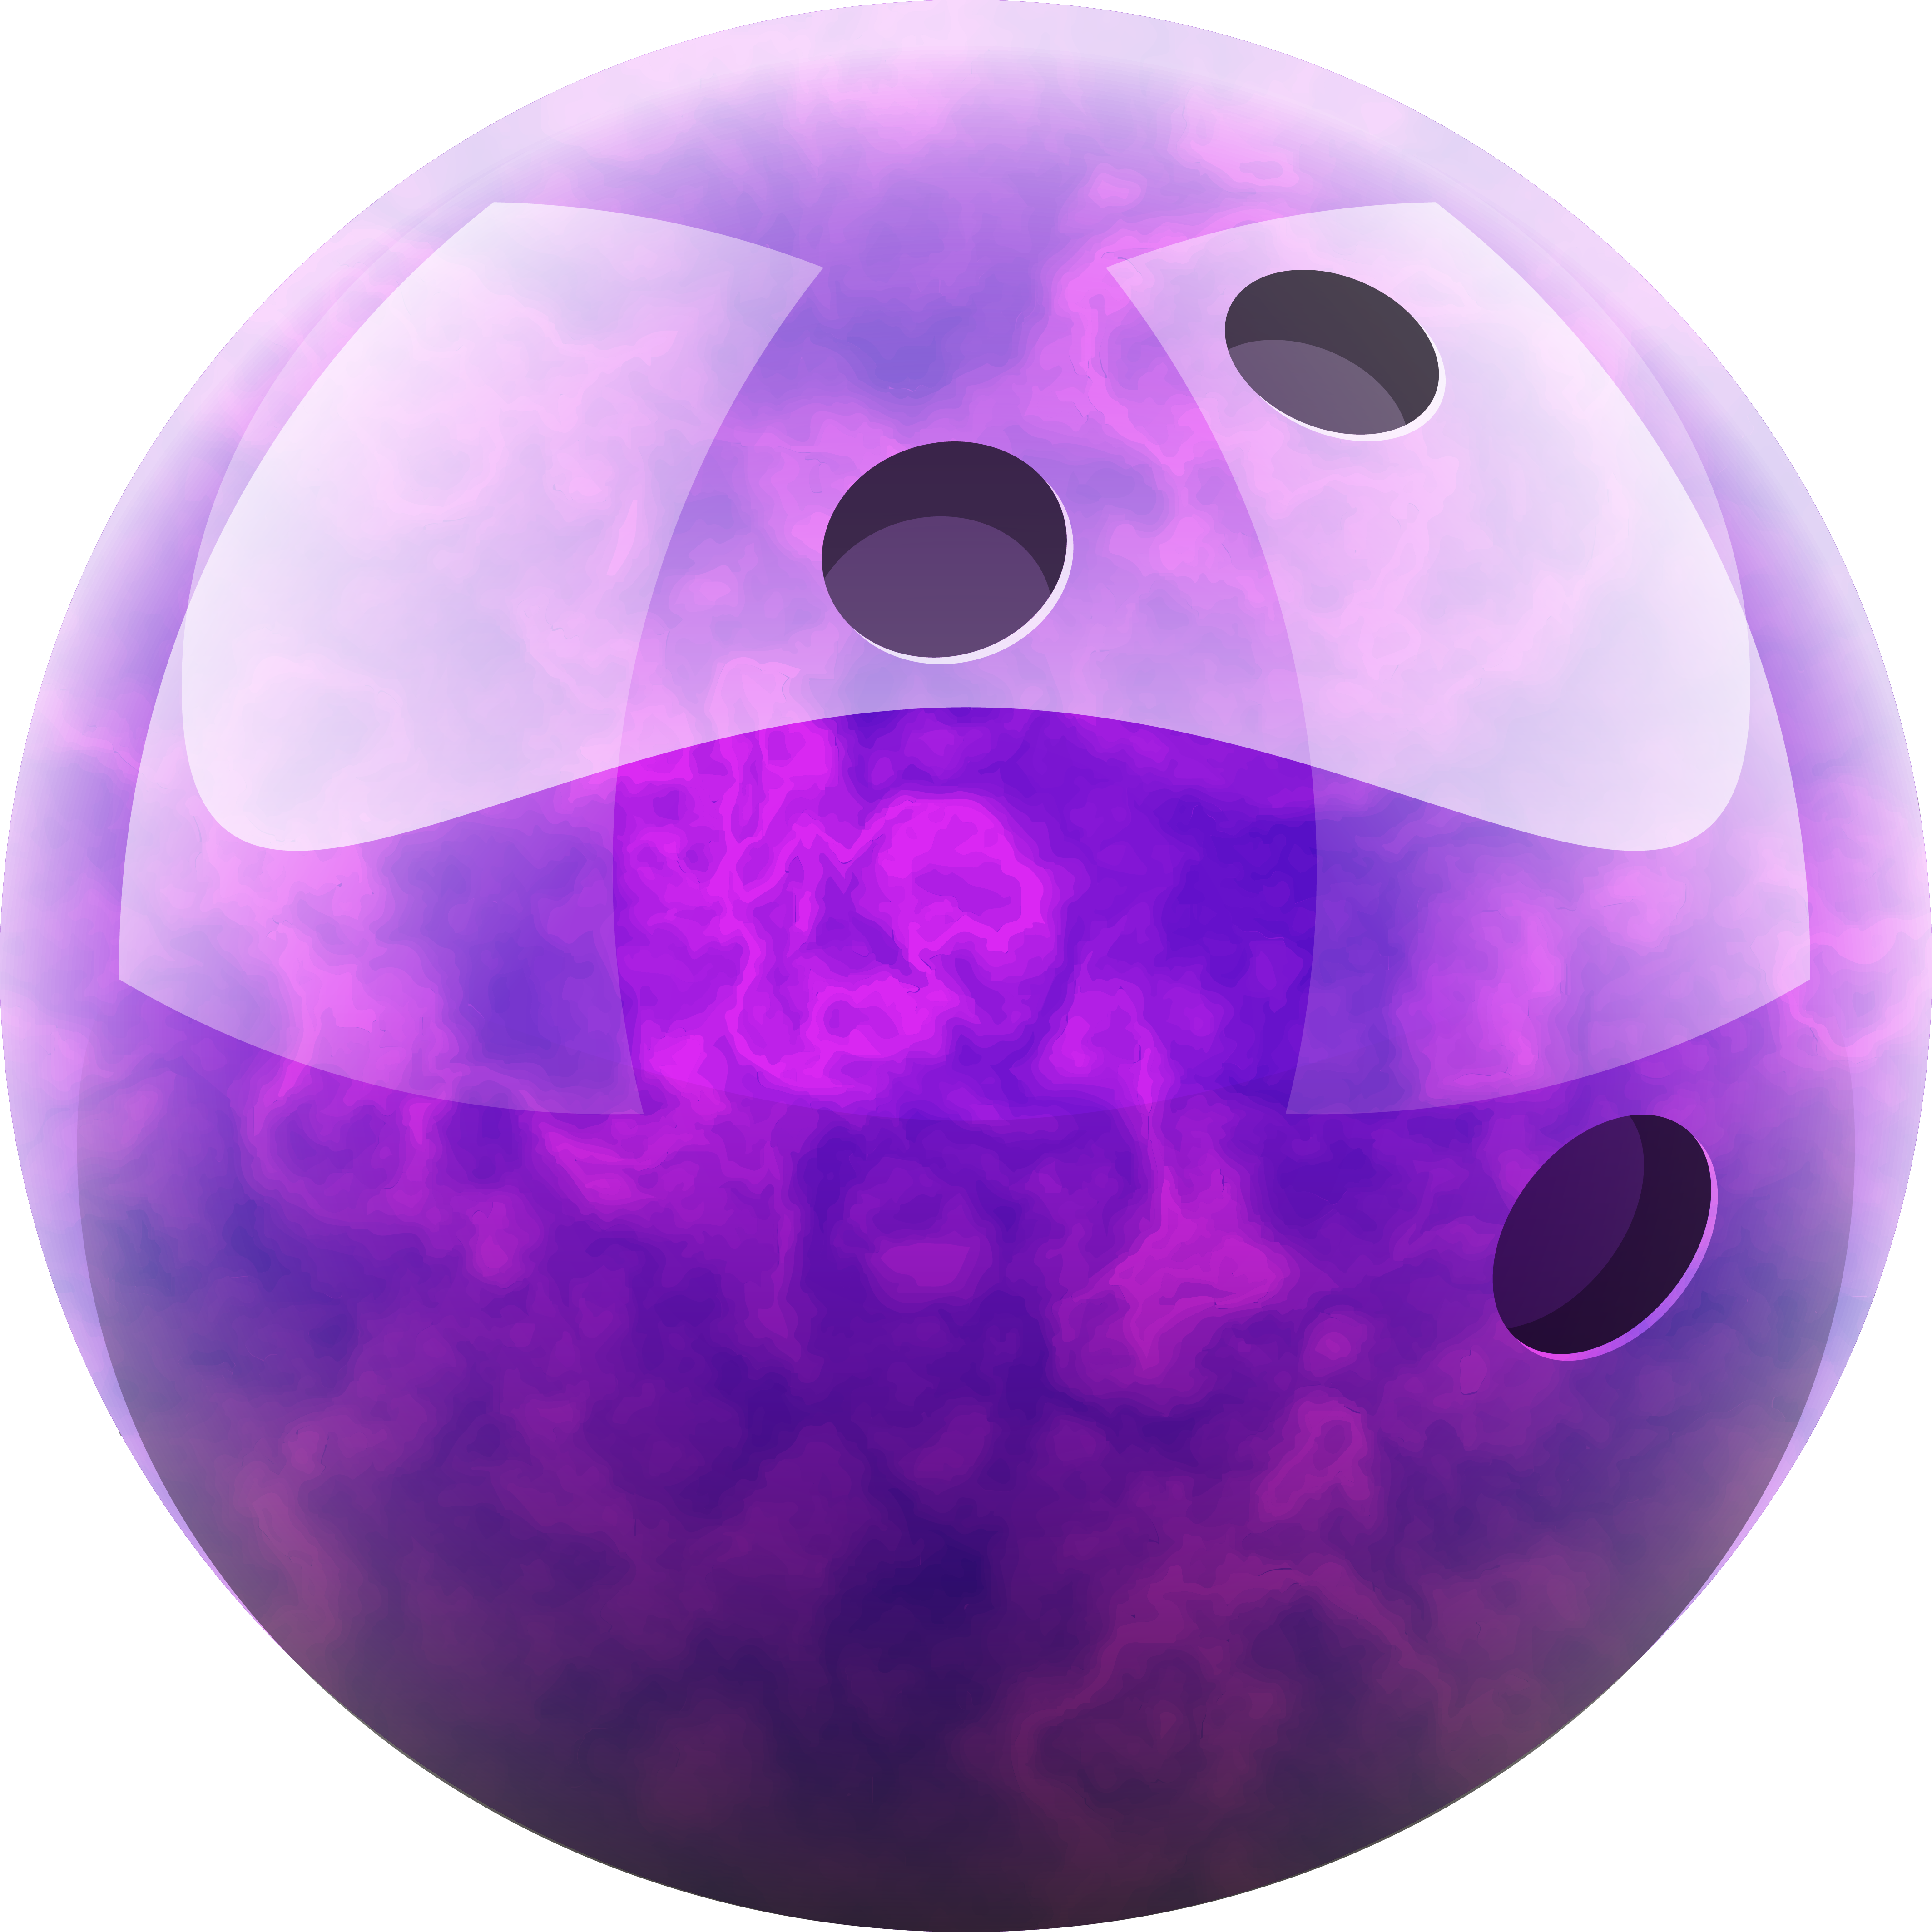 4254x4254 Bowling Ball Clip Art